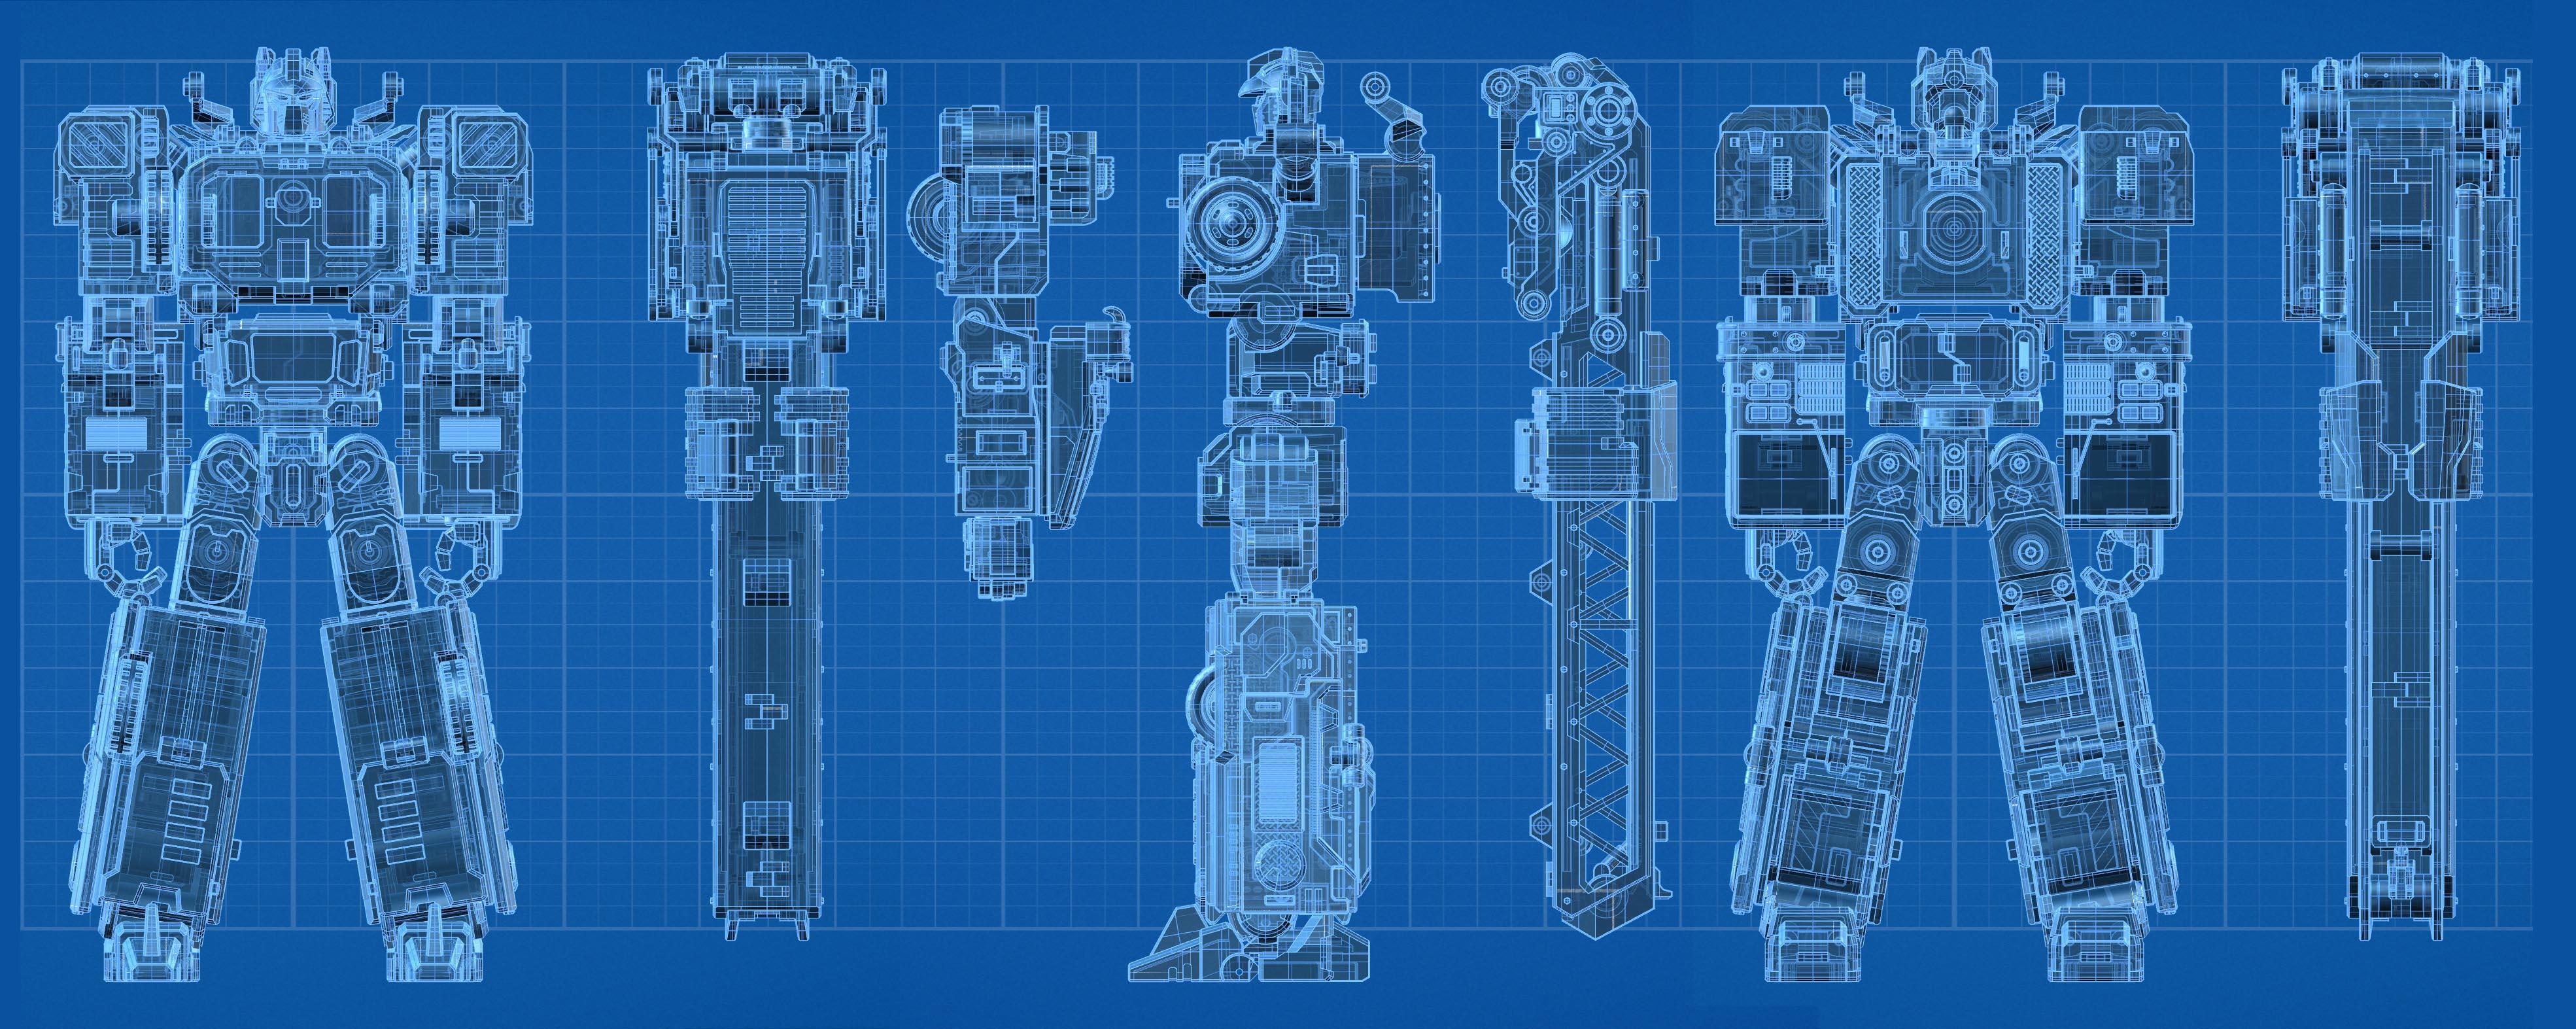 [Ocular Max] Produit Tiers - Maximus Pro (PS-21 à PS-25) - aka Defensor/Défenso JUwbJgrp